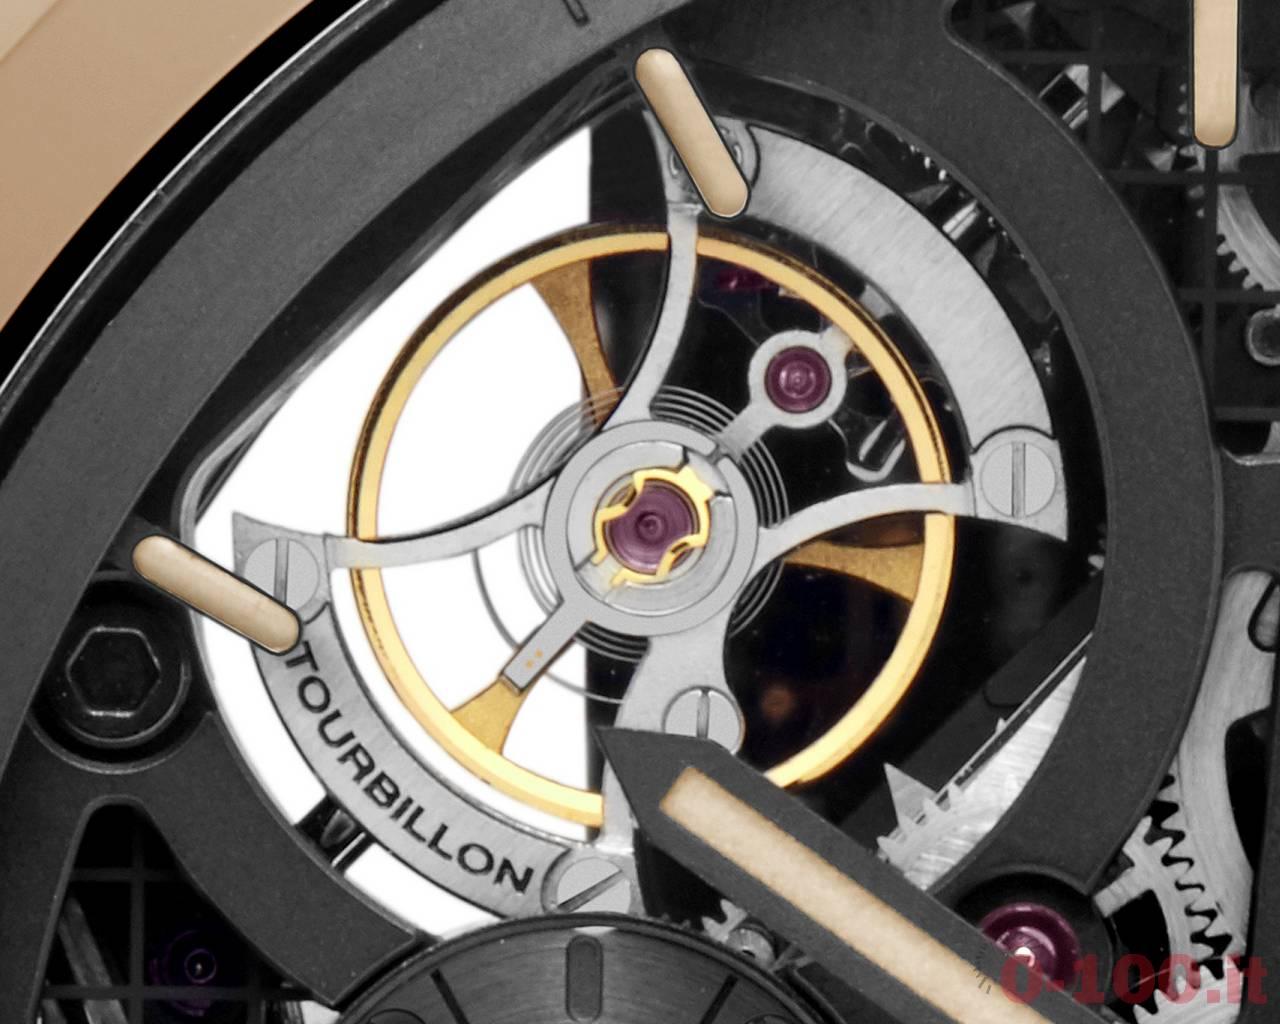 officine-panerai-radiomir-1940-minute-repeater-carillon-tourbillon-gmt-pam00600_0-10020